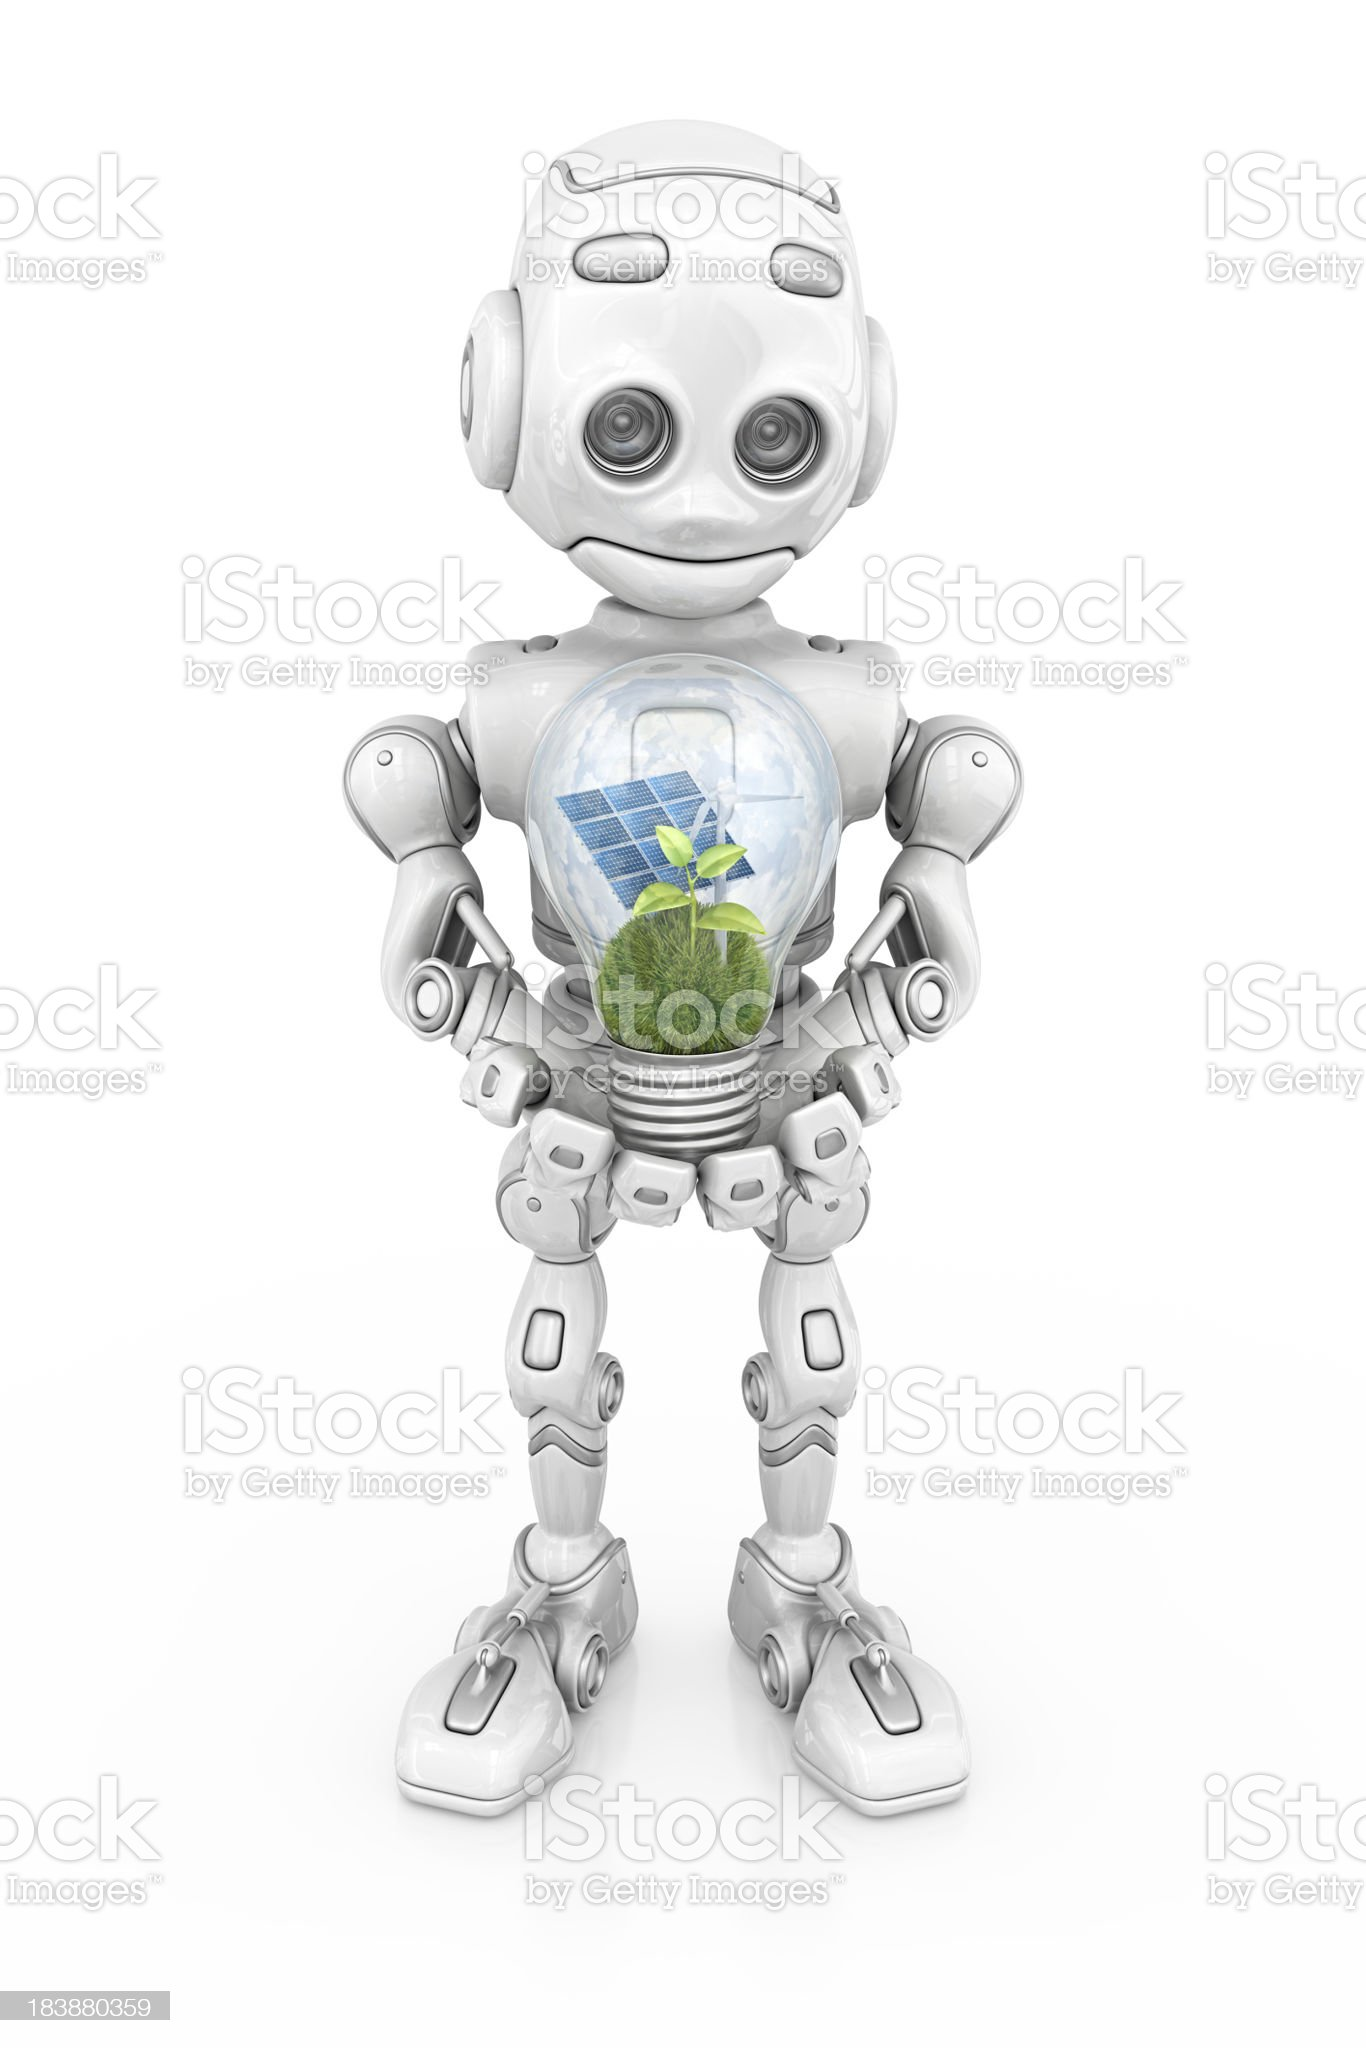 robot holding eco light bulb royalty-free stock photo